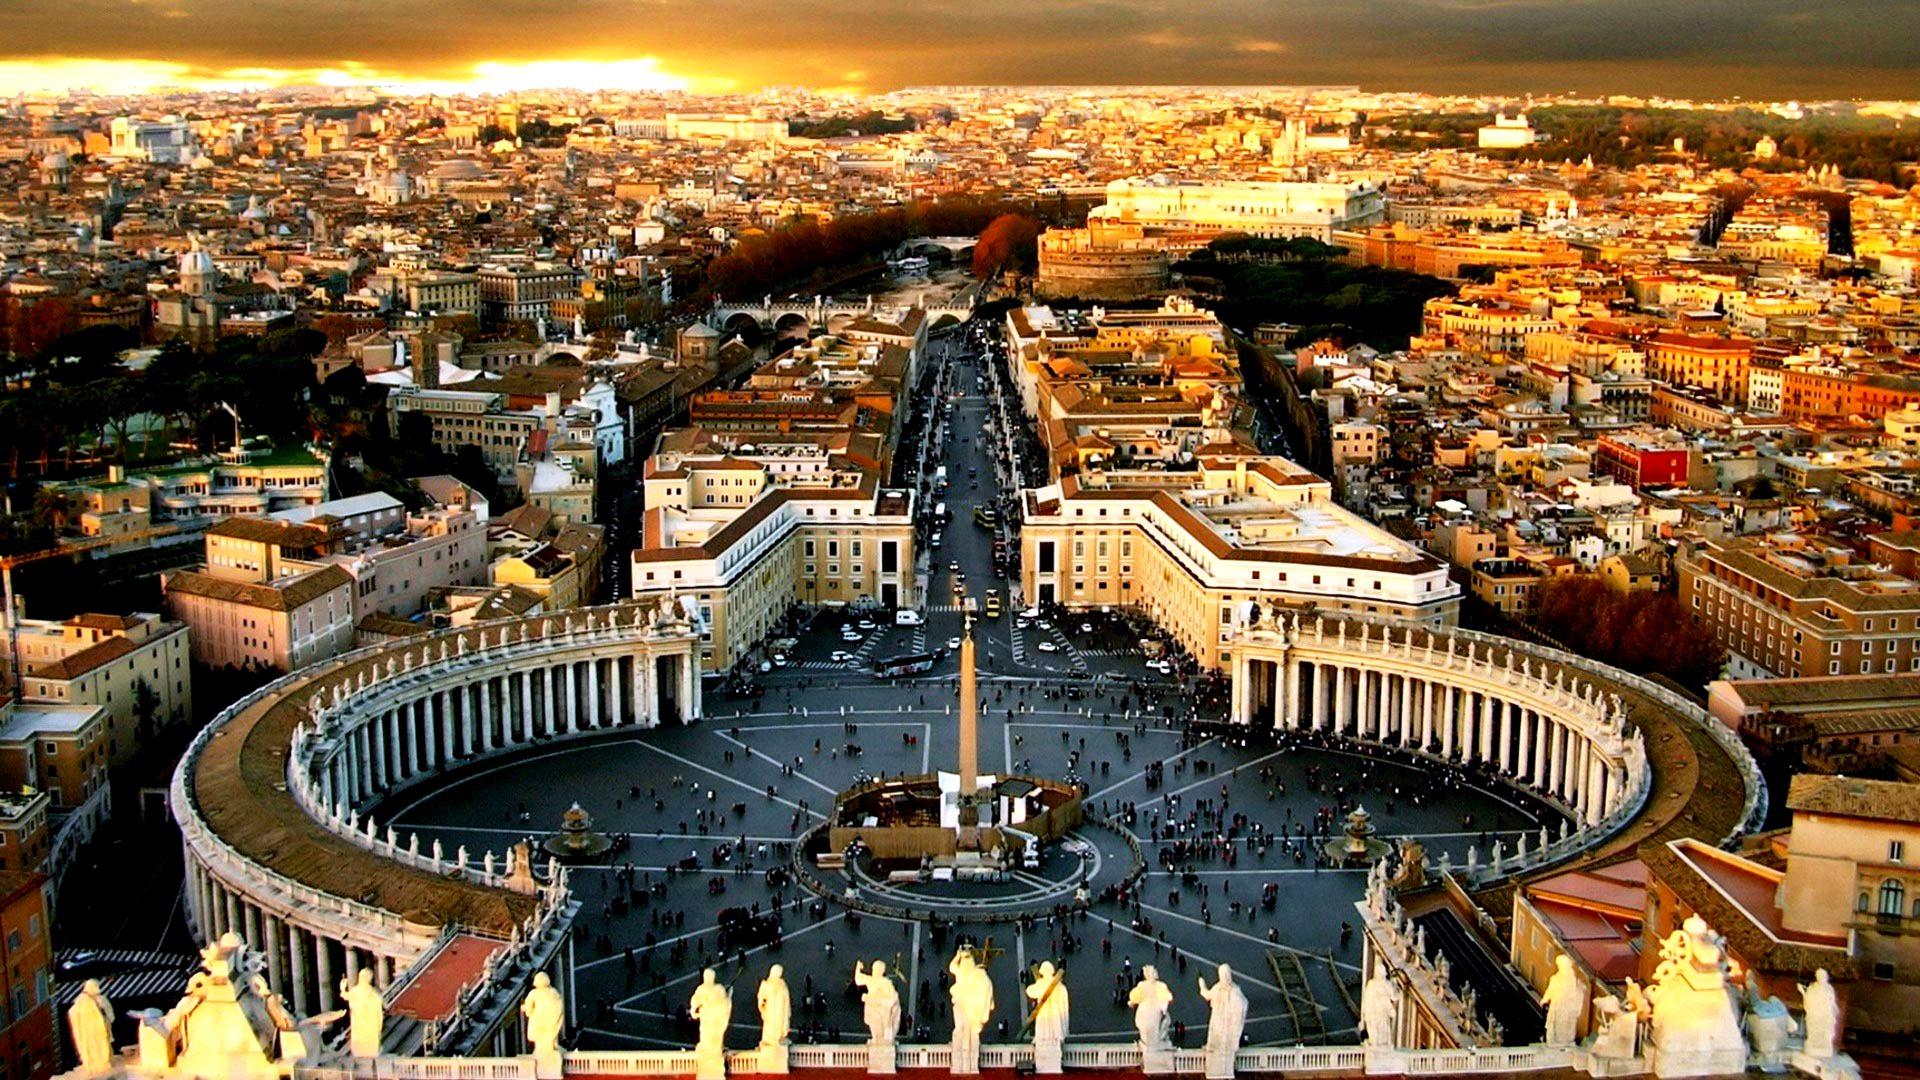 площадь базилики святого петра